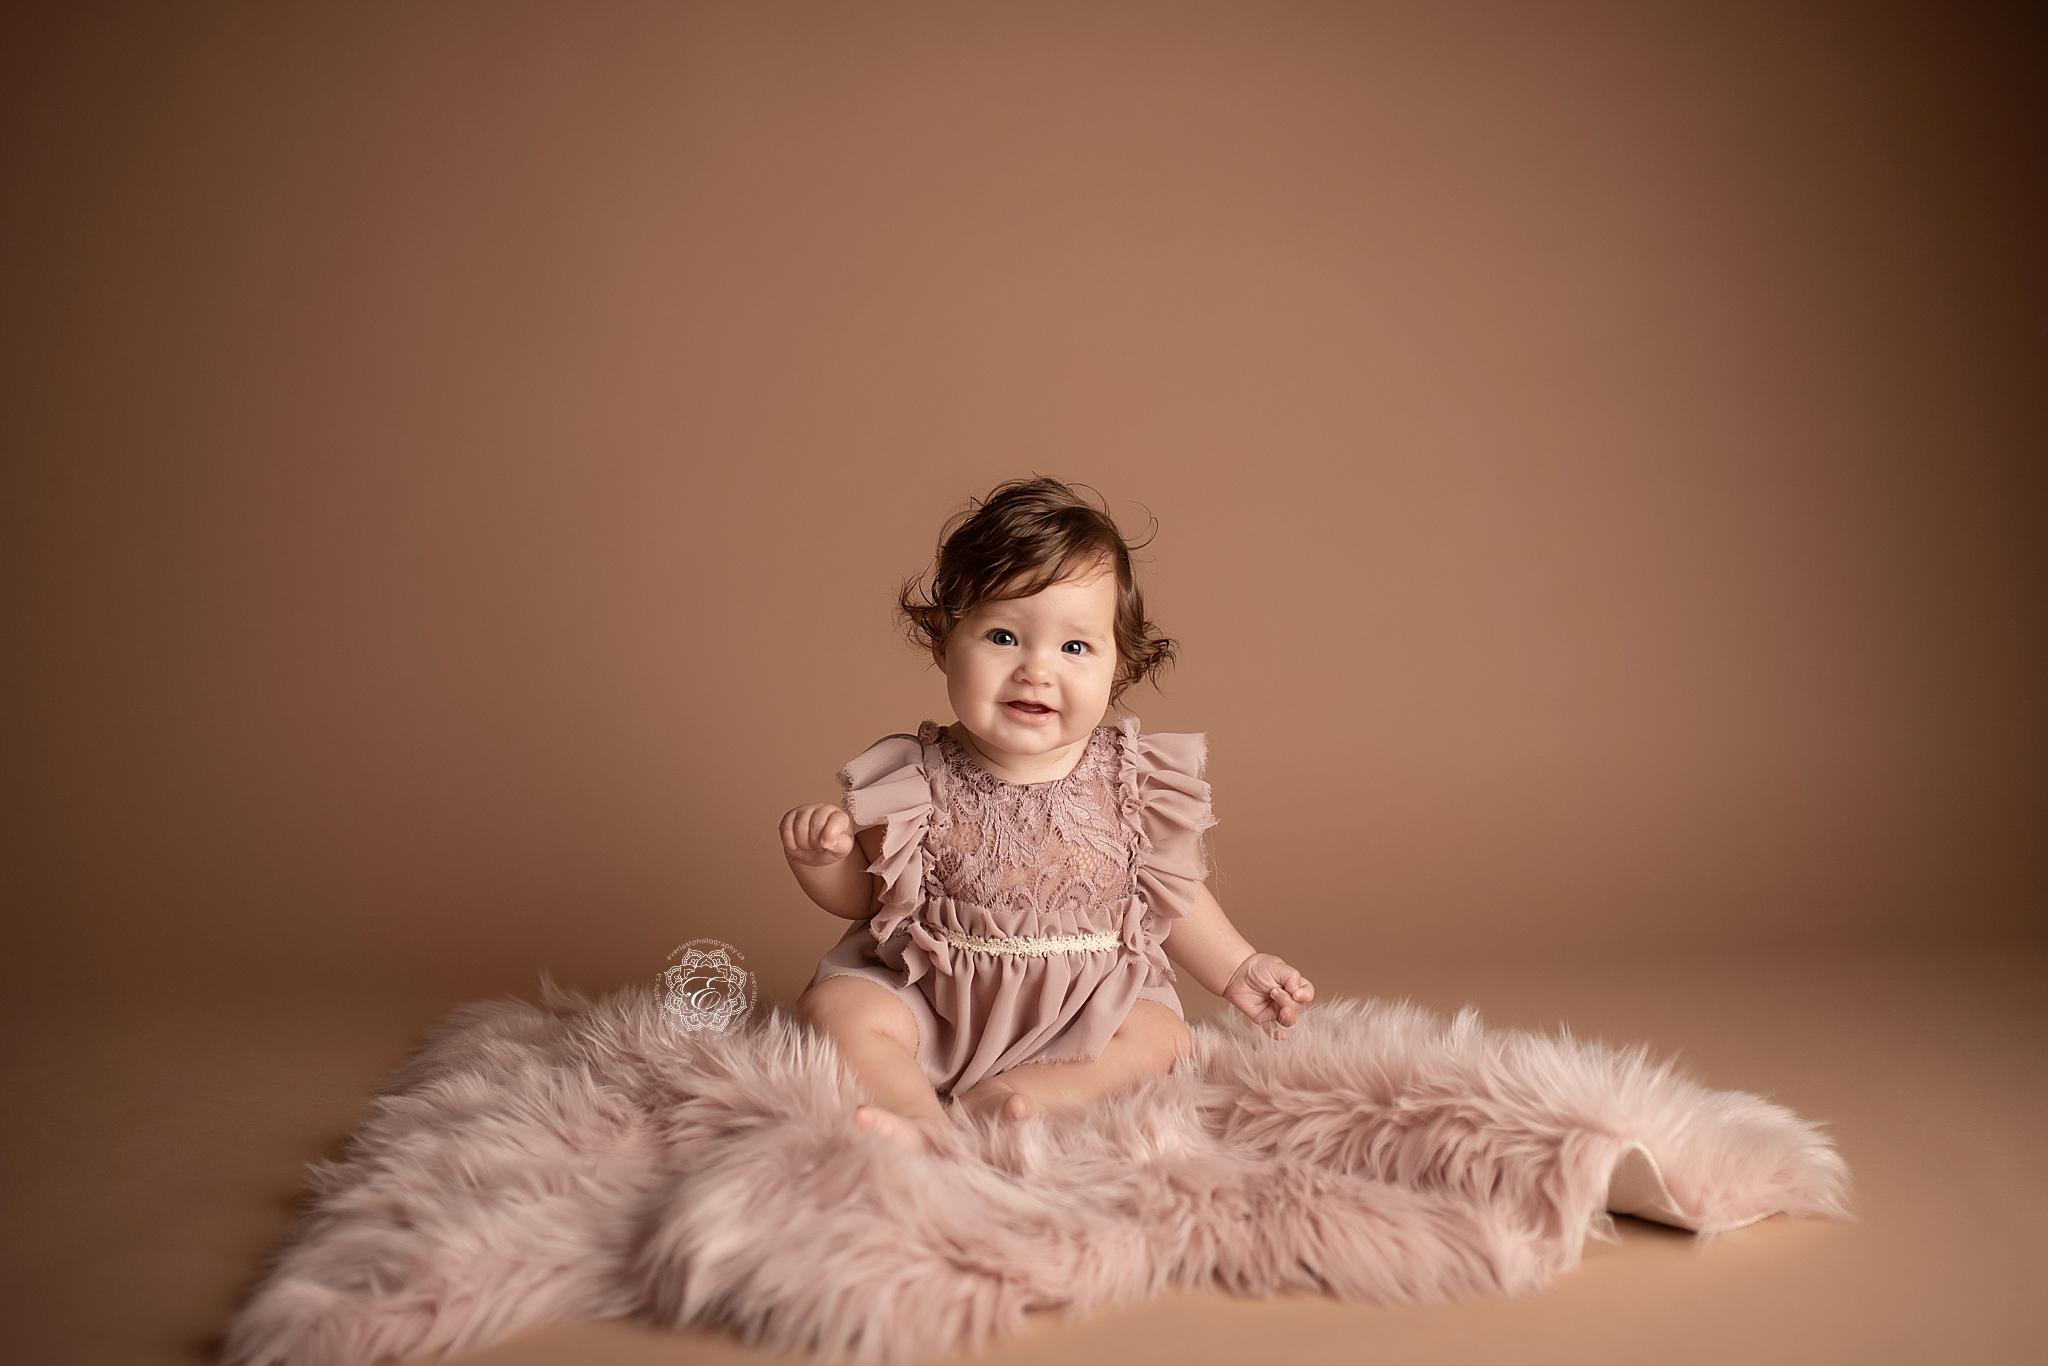 edmonton-best-baby-phootgraphers.jpg